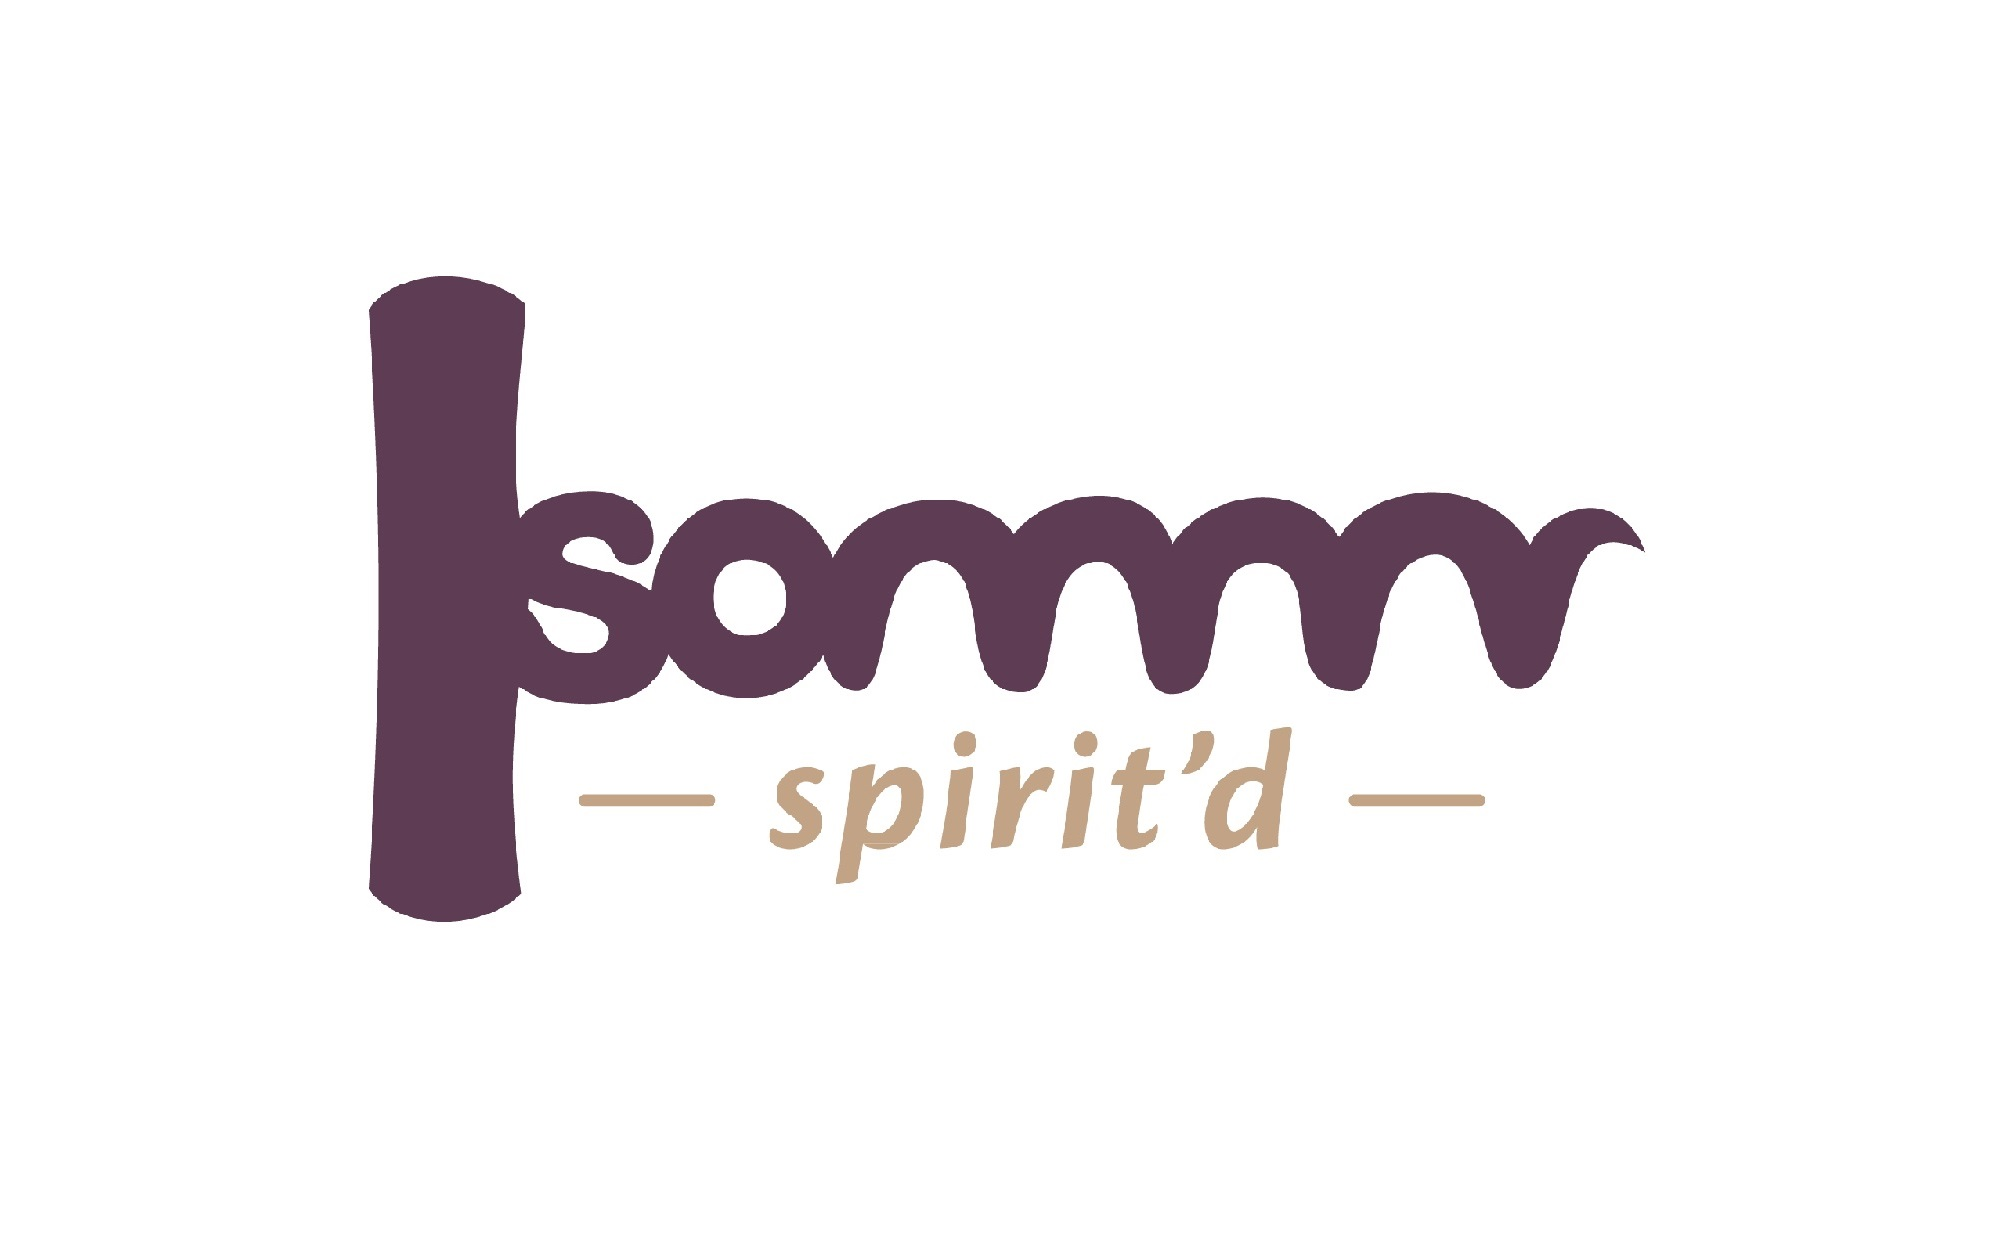 Somm Spirit'd 侍酒魂